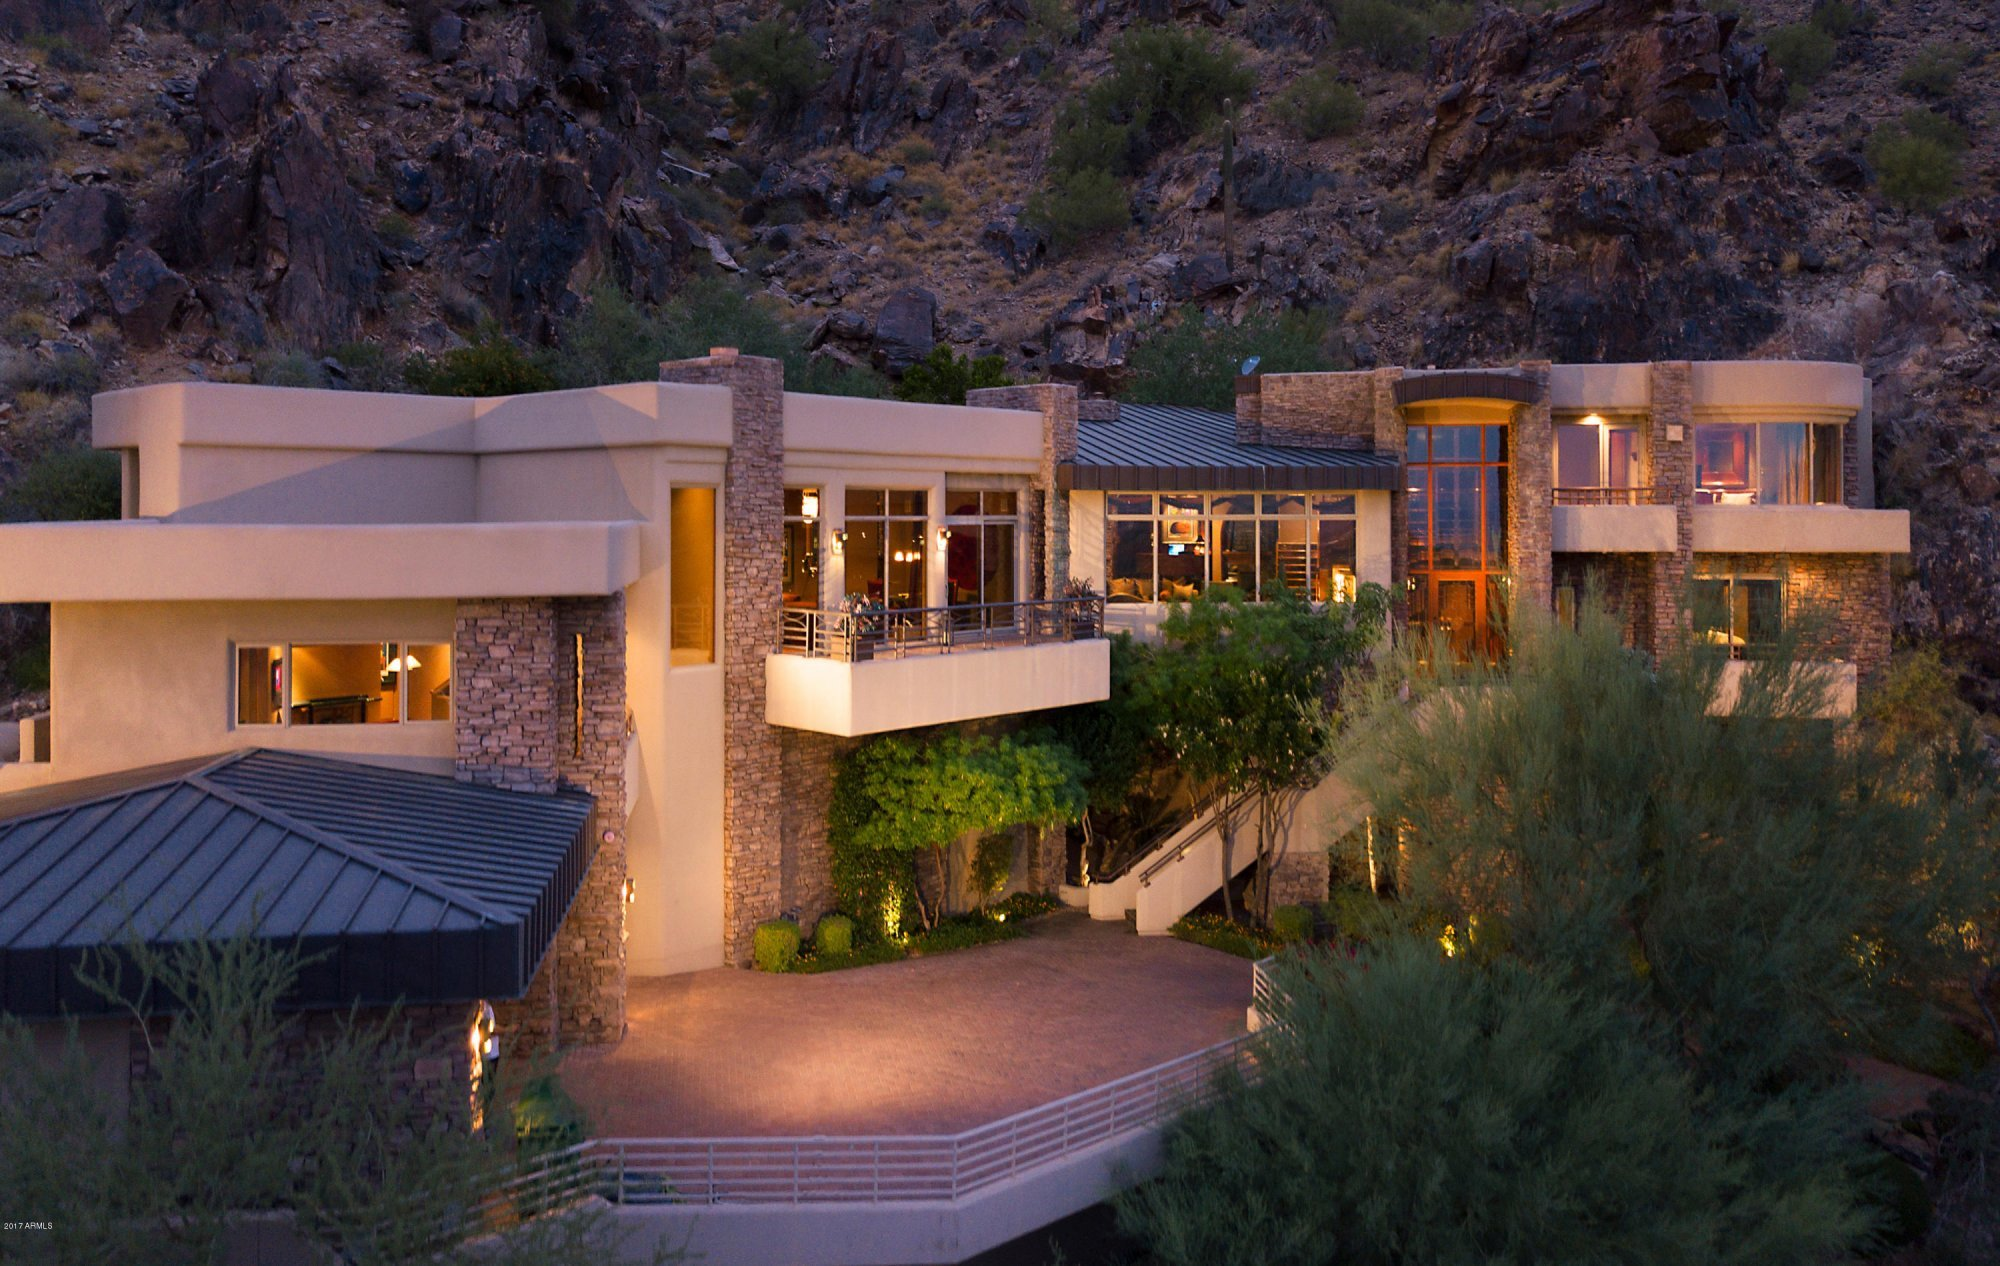 Phoenix Homes for Sale in AZ